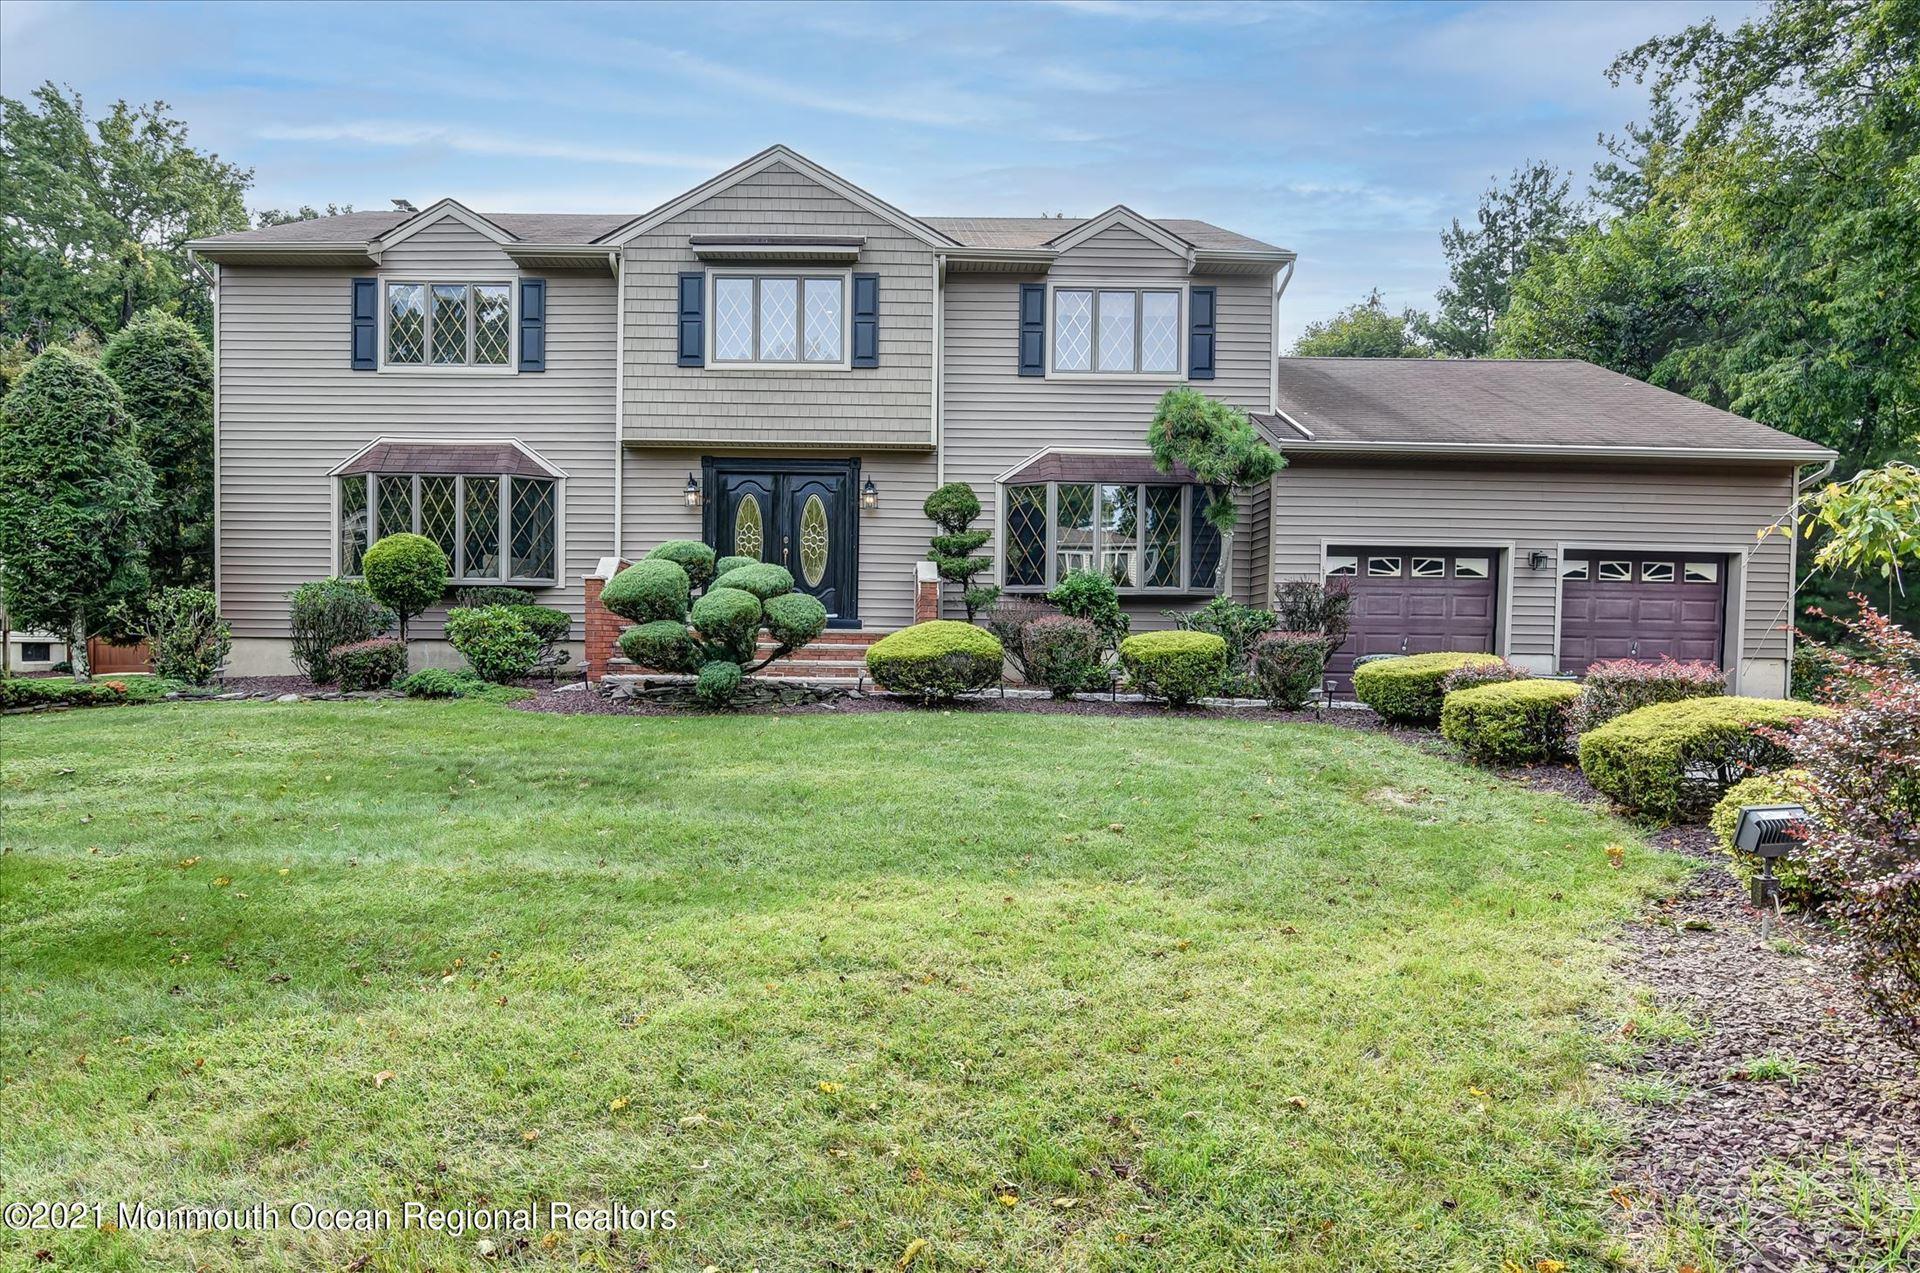 2 Carter Drive                                                                               Marlboro                                                                      , NJ - $835,000